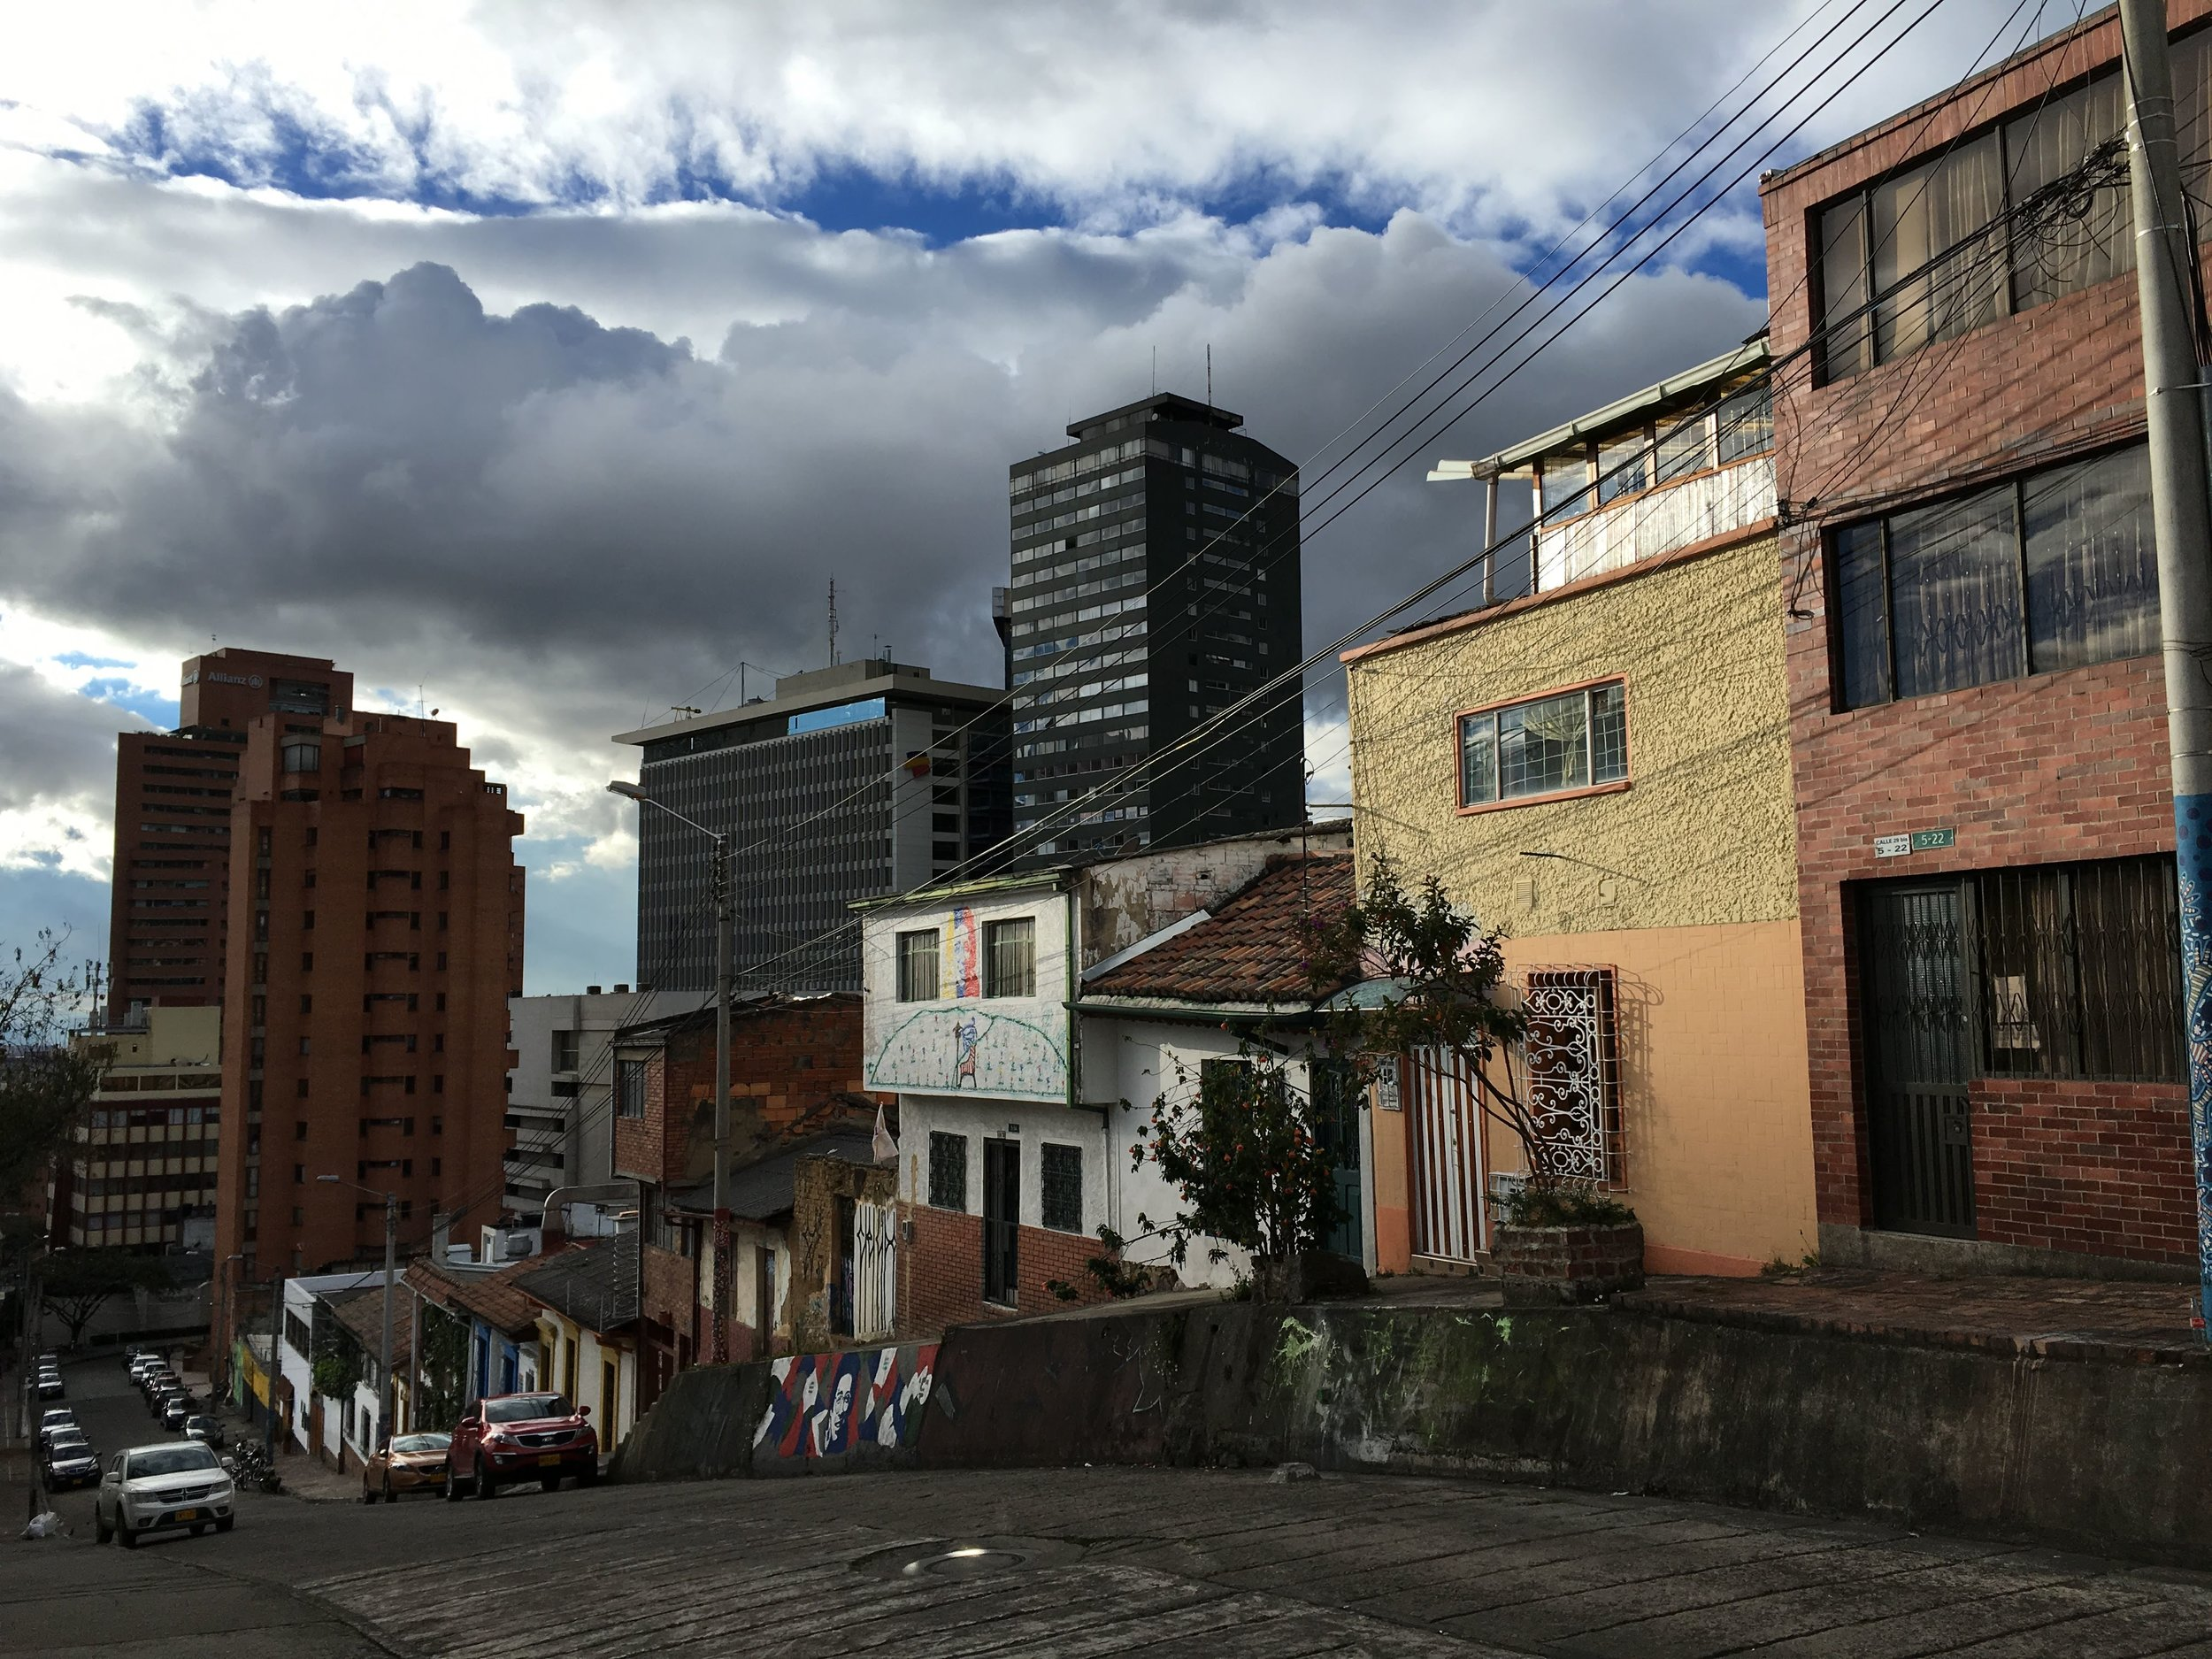 Bogota - 1. Azahar Cafe 932. Casa Café Cultor3. Colo CoffeeFull Colombia list here.